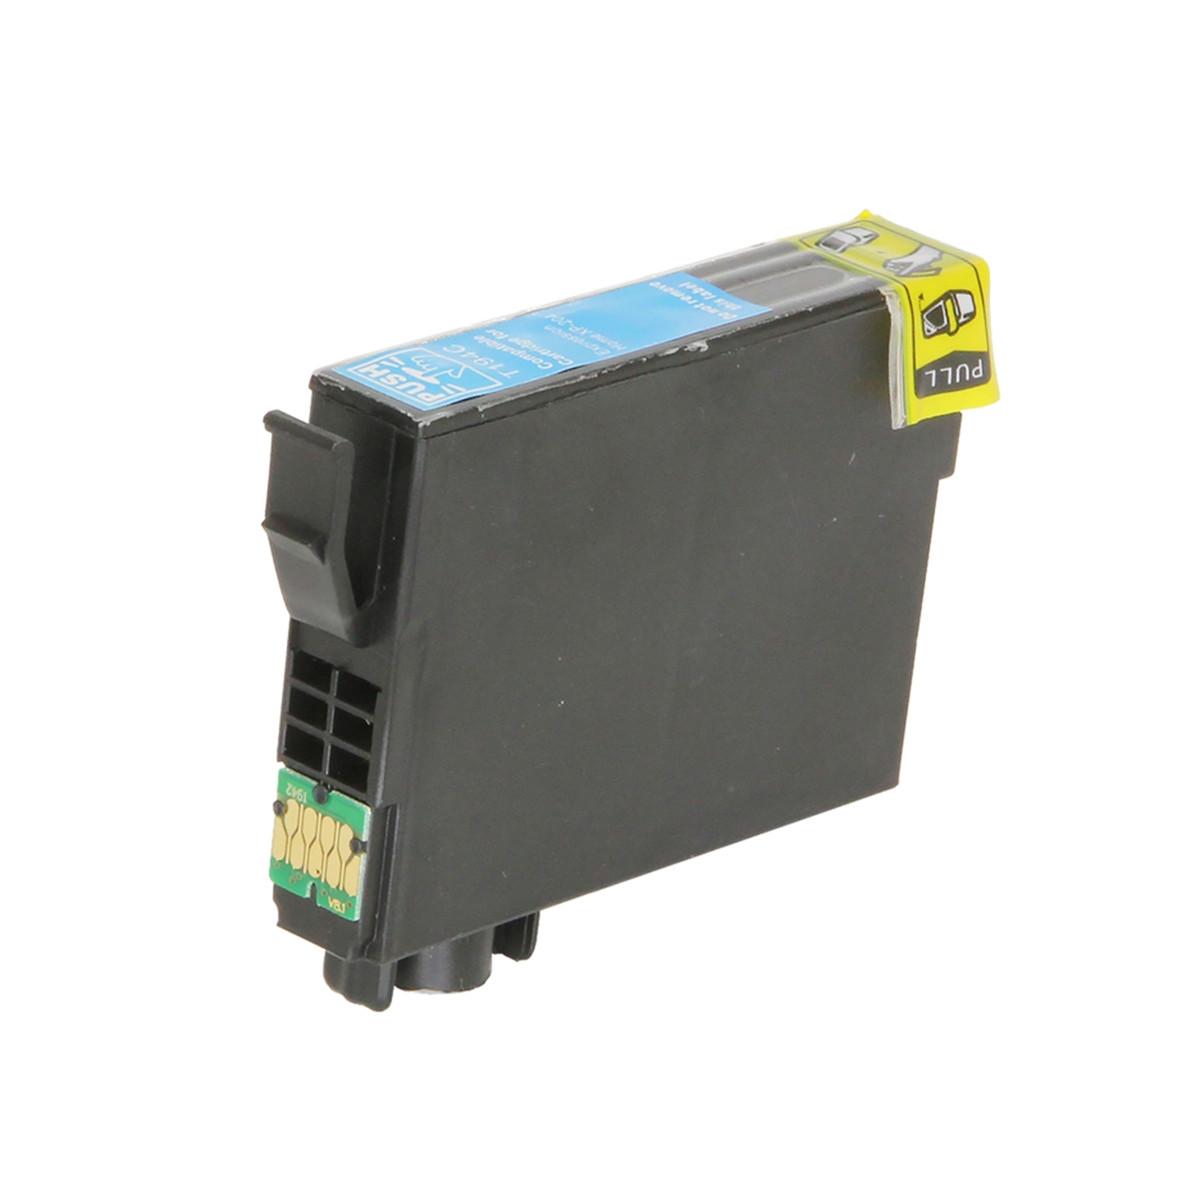 Cartucho de Tinta Compatível com Epson T194 T194220 T1942 Ciano | XP214 XP204 XP 204 | 6ml